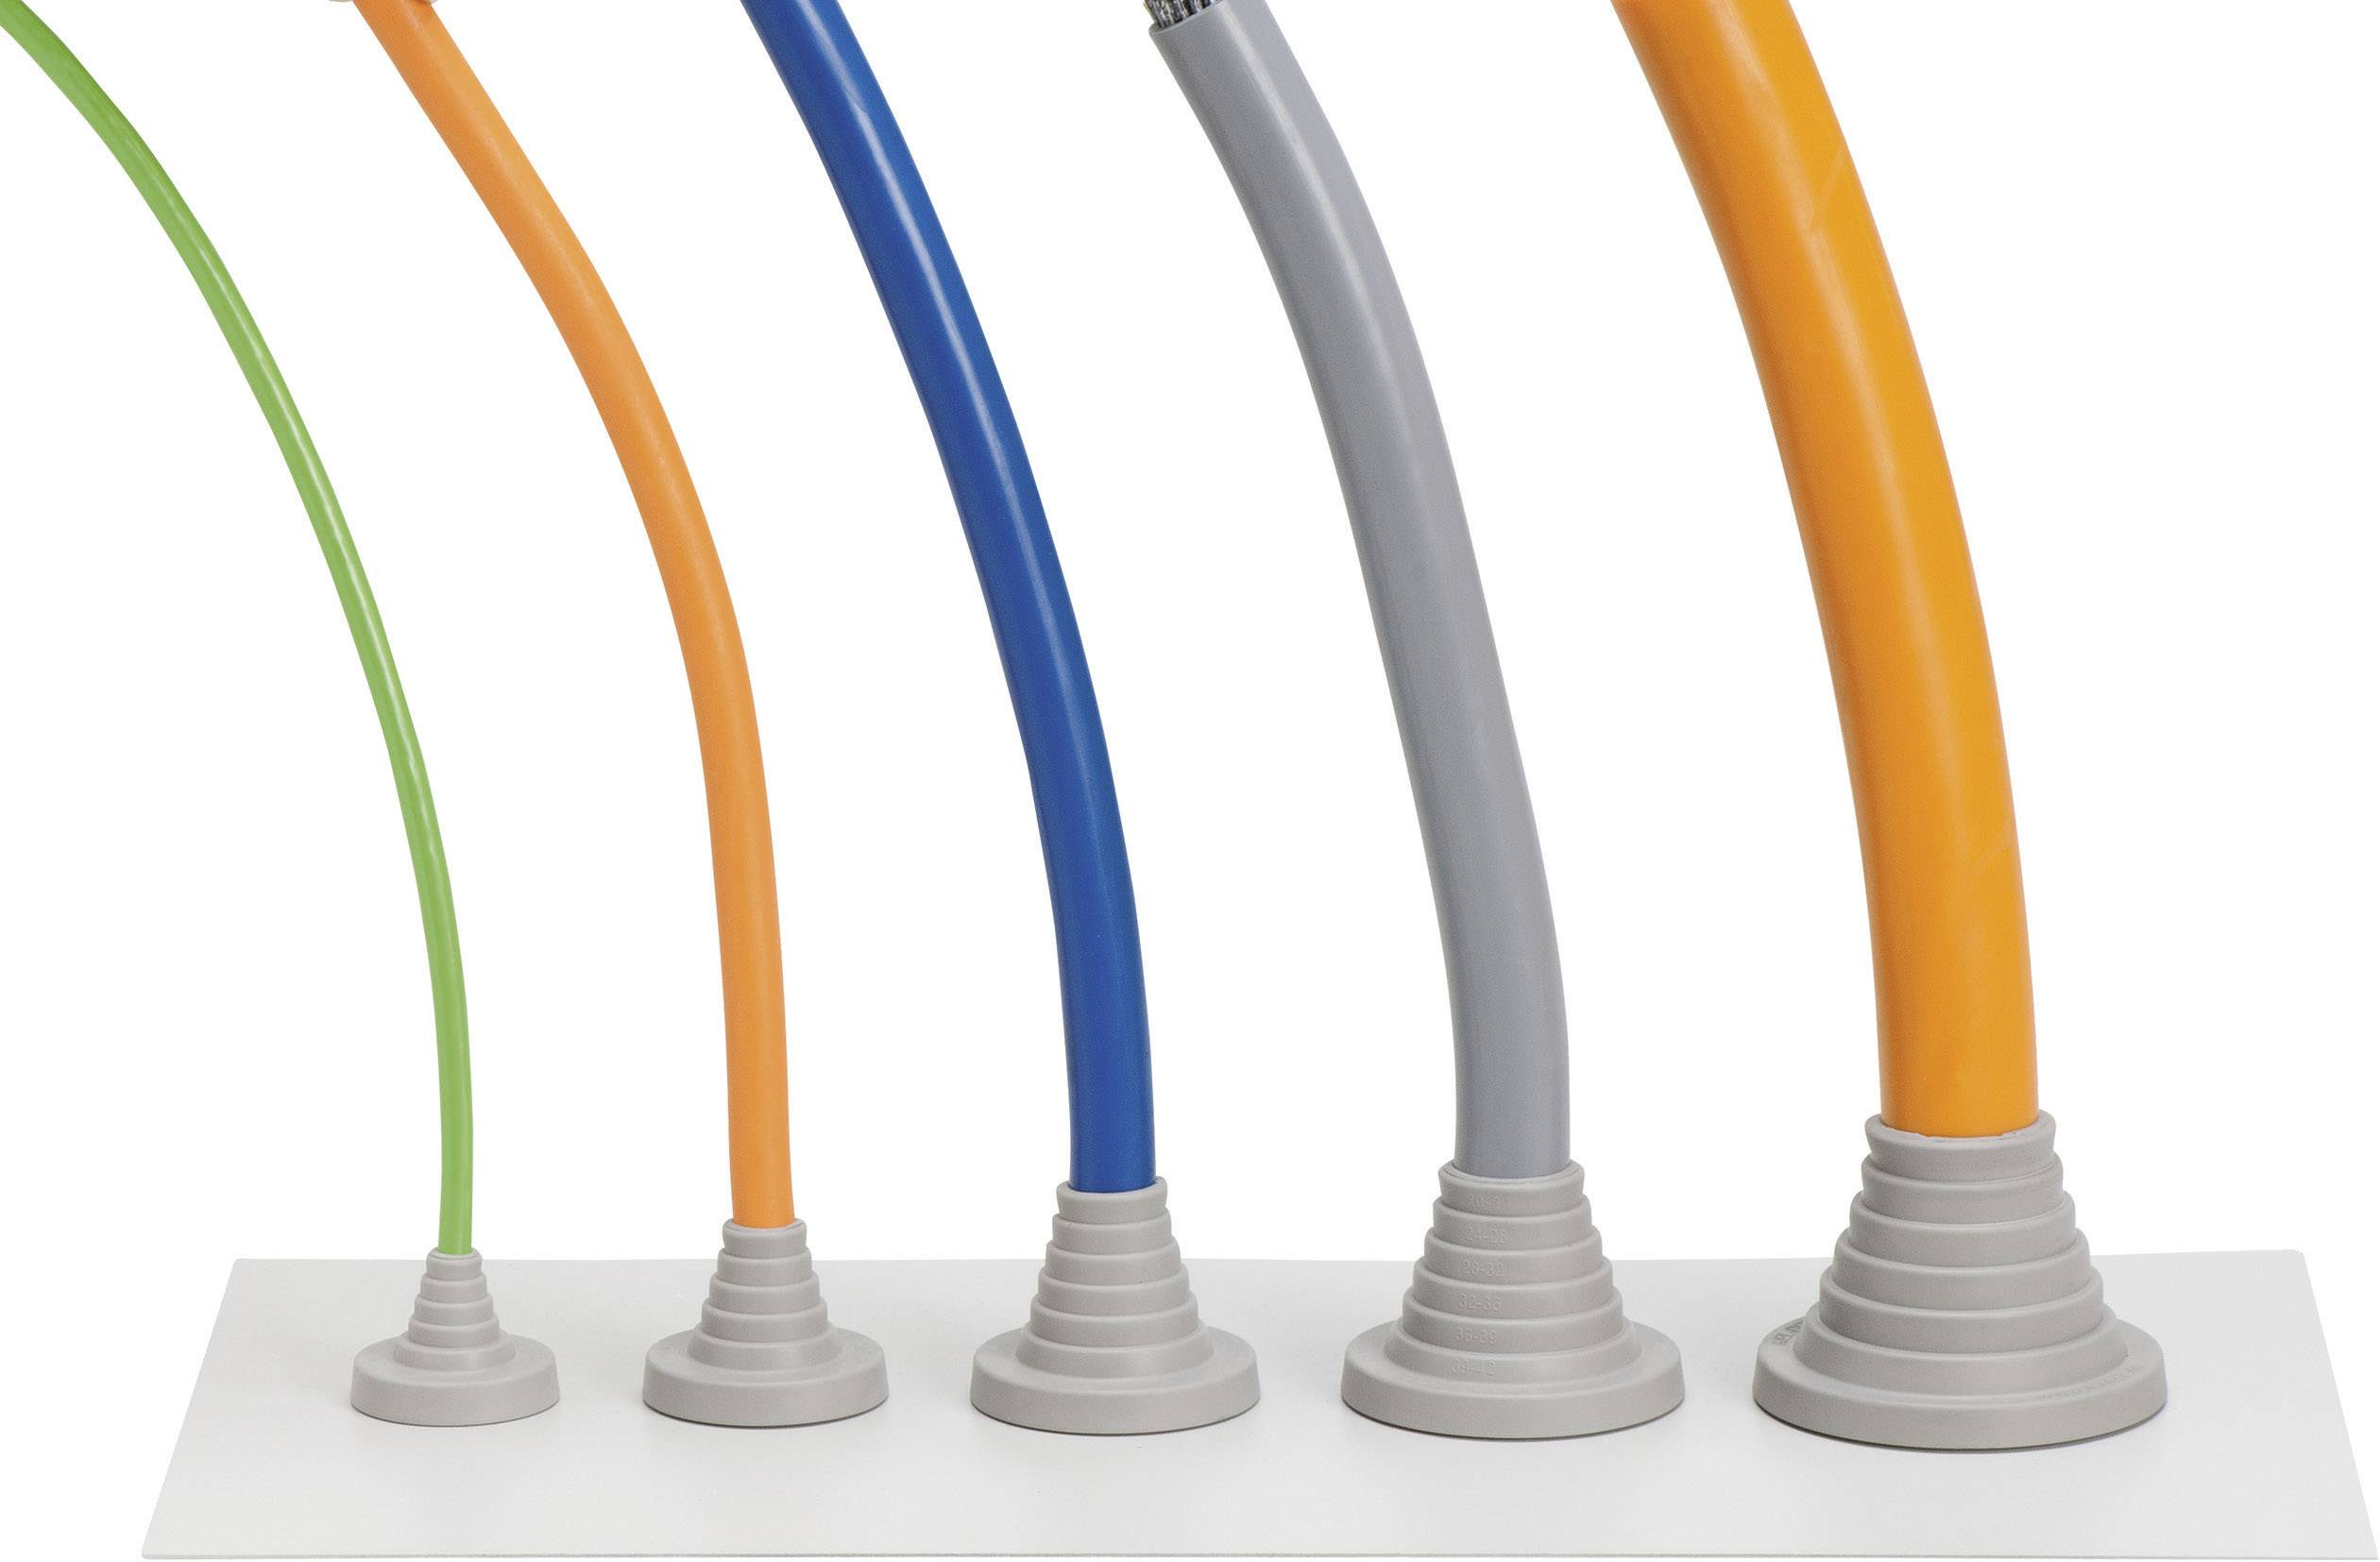 Icotek Uvodna kapa za kable KEL-DPF KEL-DPF 40/11-32 za kabel- 11 - 32 mm, velikost: M40 poliamid/elastomer, siva